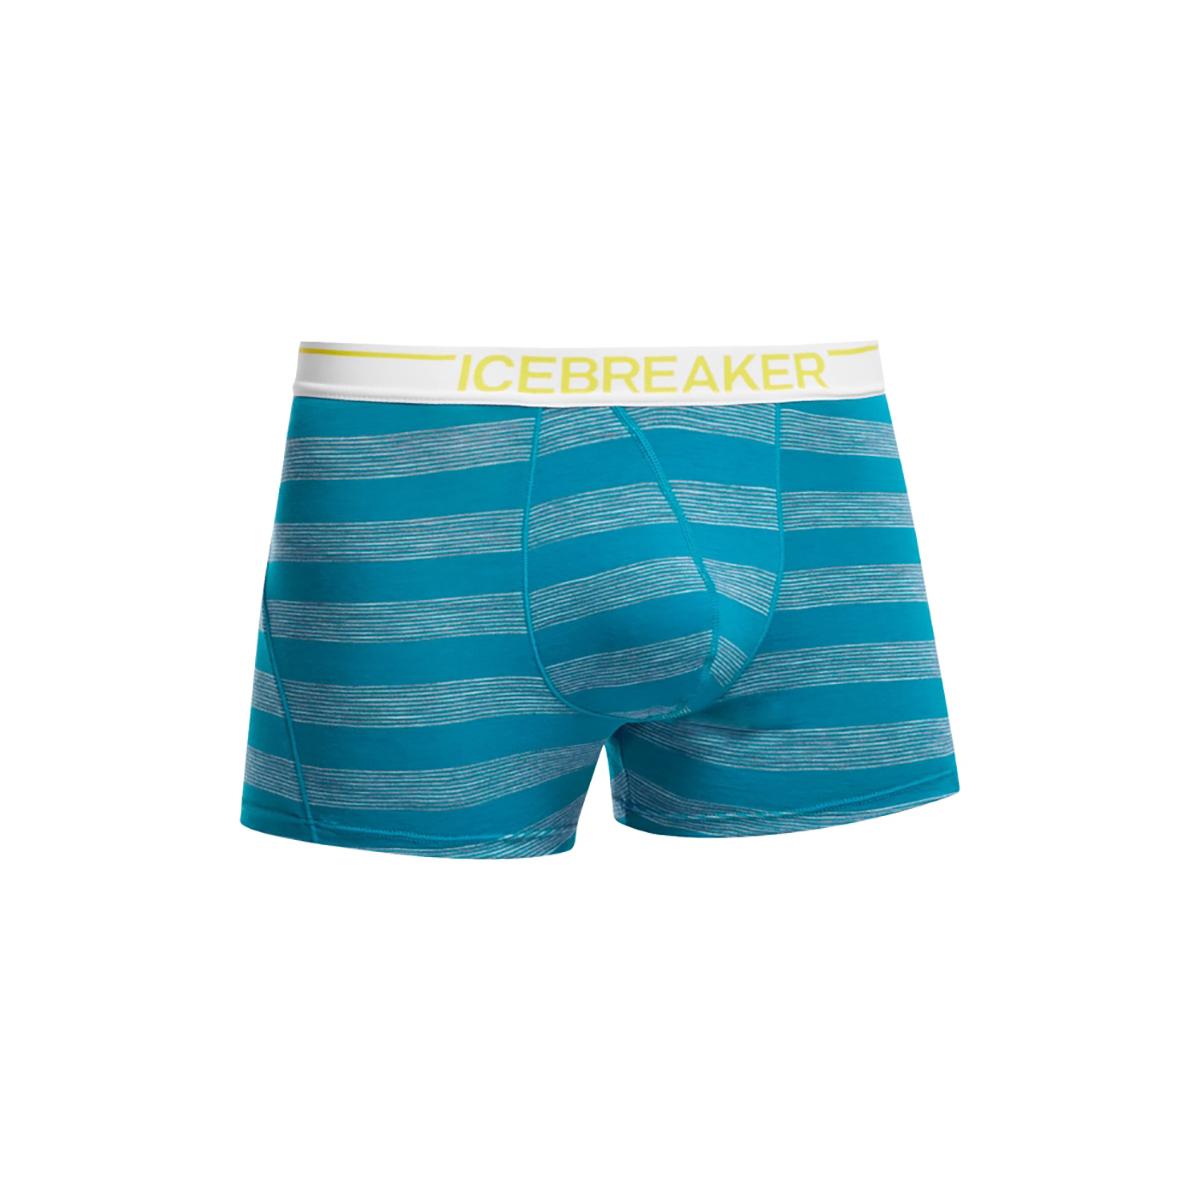 2cefeab3d6bdc5 Icebreaker Anatomica Boxers Stripe 2016 | Base Layers | EpicTV Shop